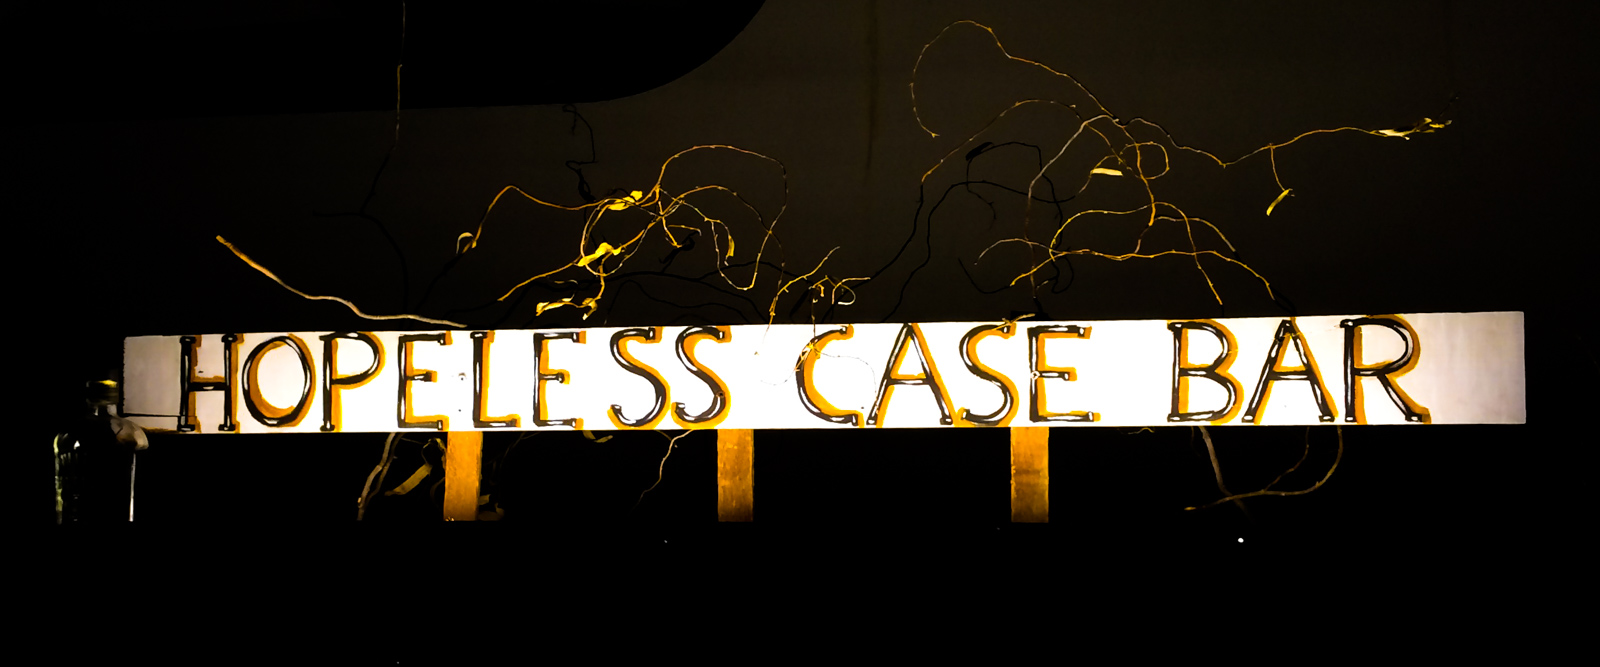 Hopeless Case Bar Clarksdale Mississippi